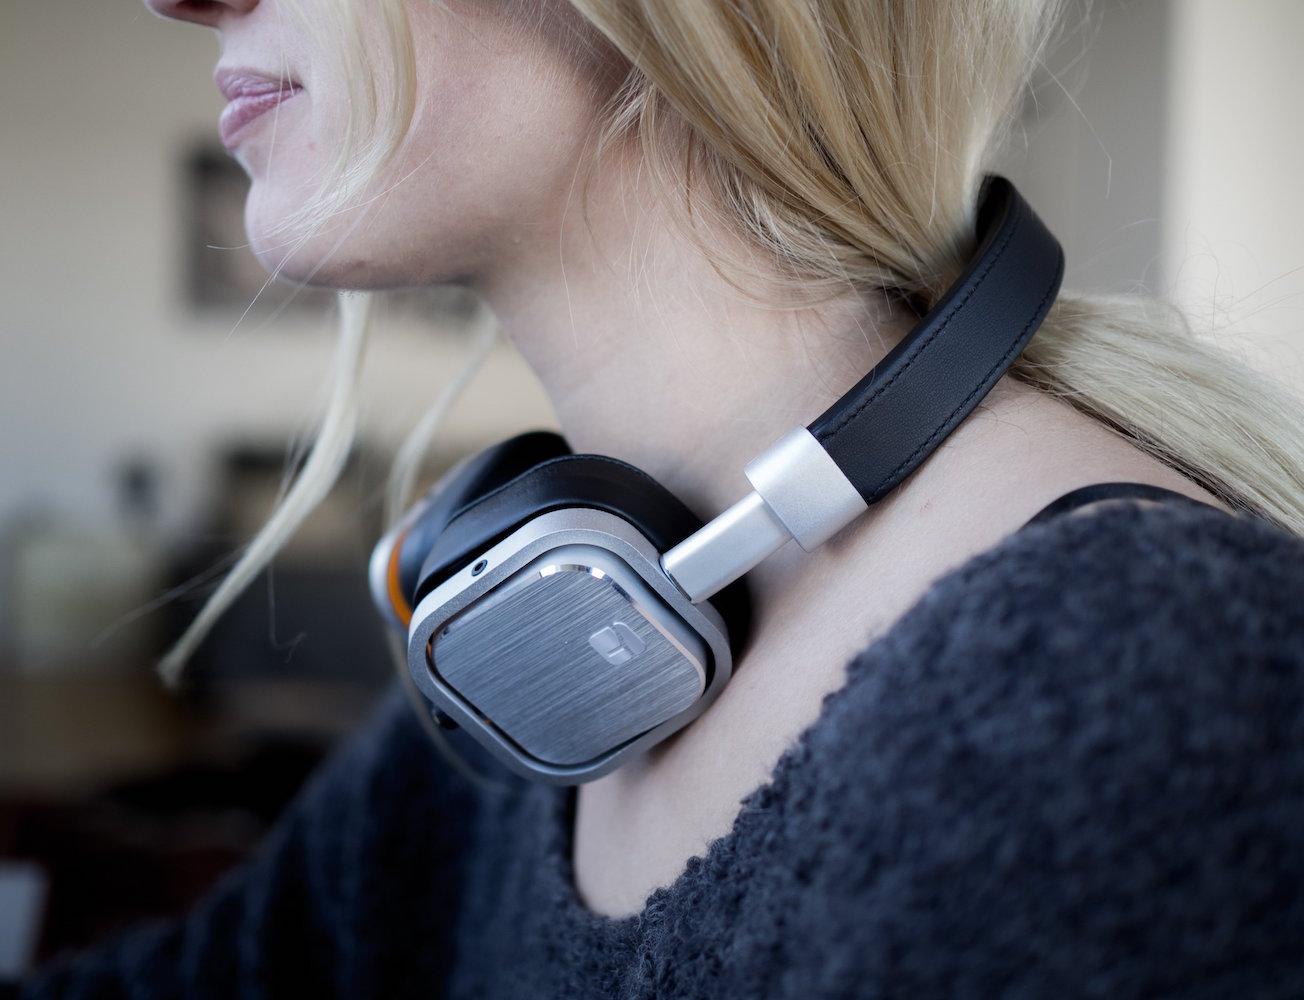 Torque Audio t402v Customizable Headphones